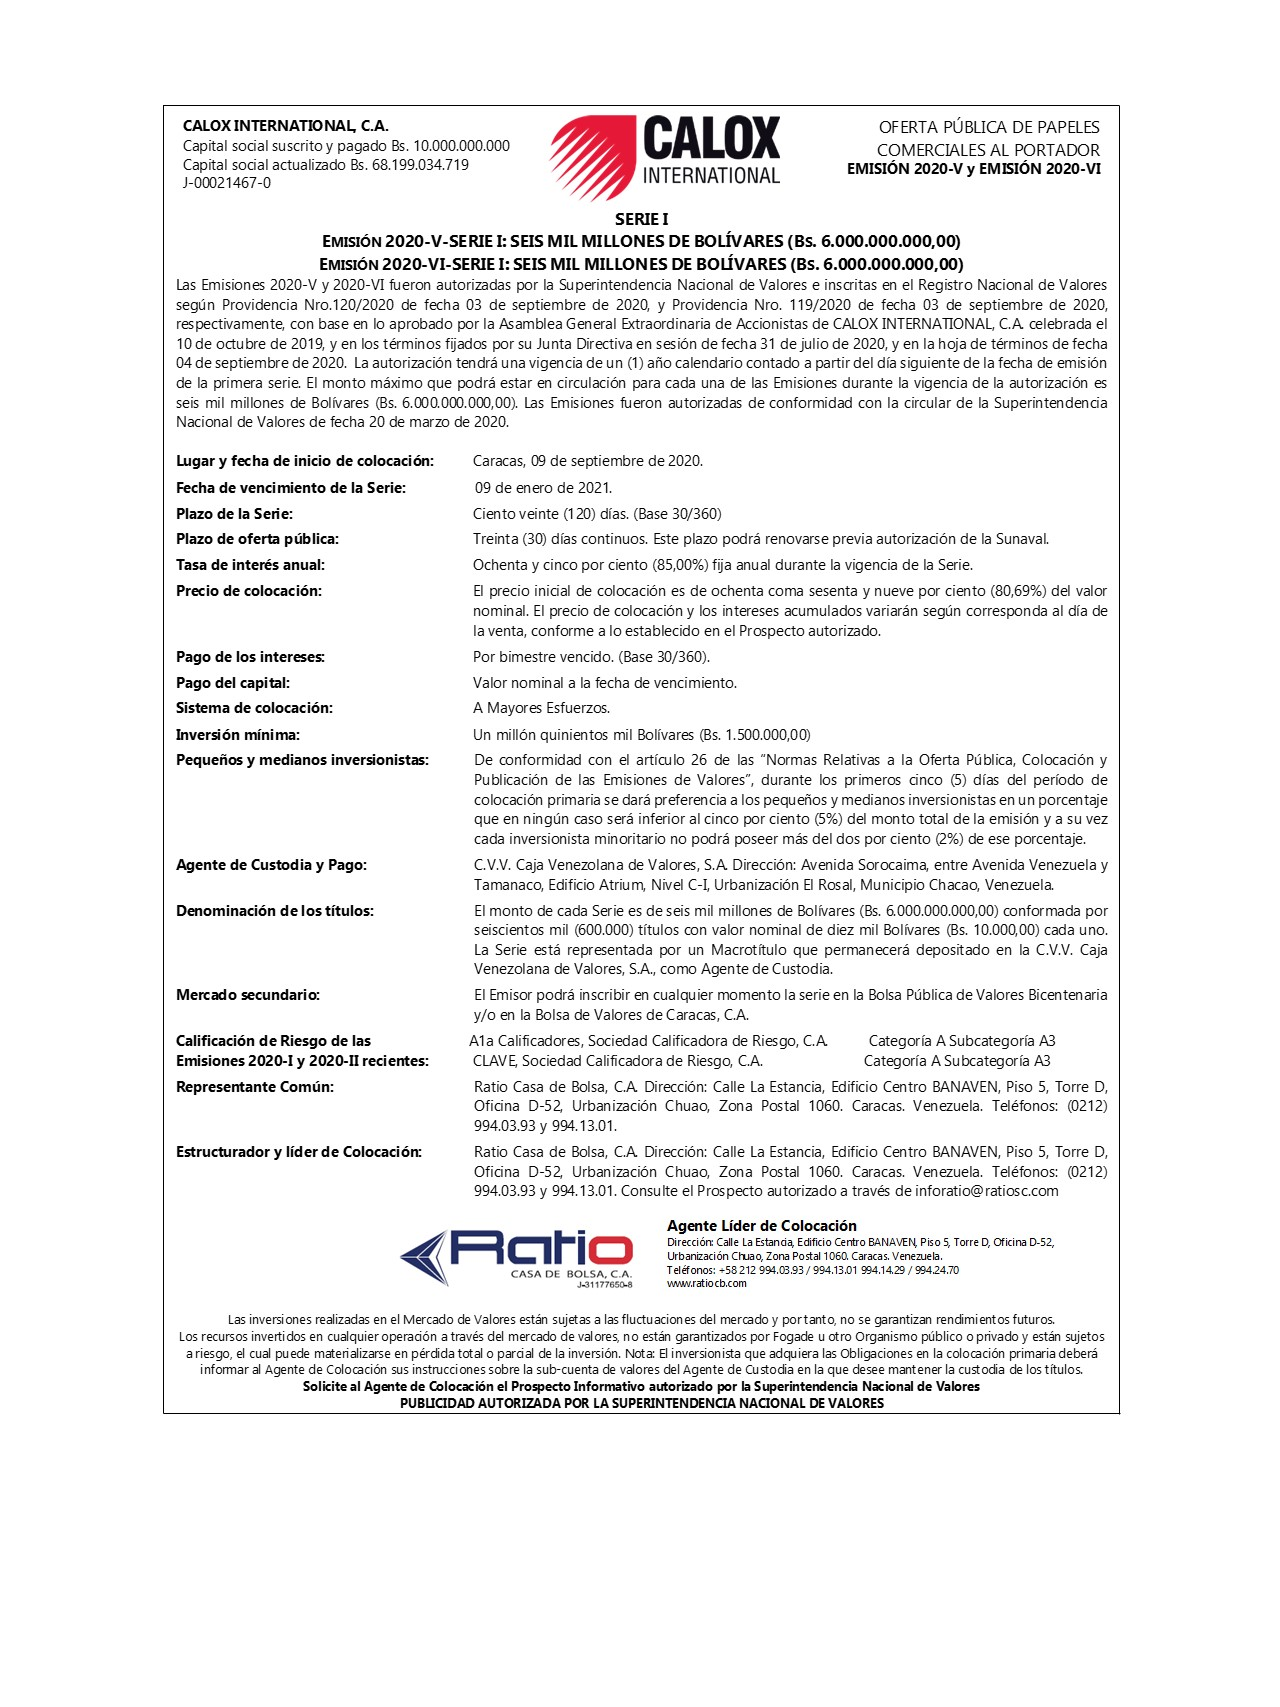 Calox 2020 V-VI